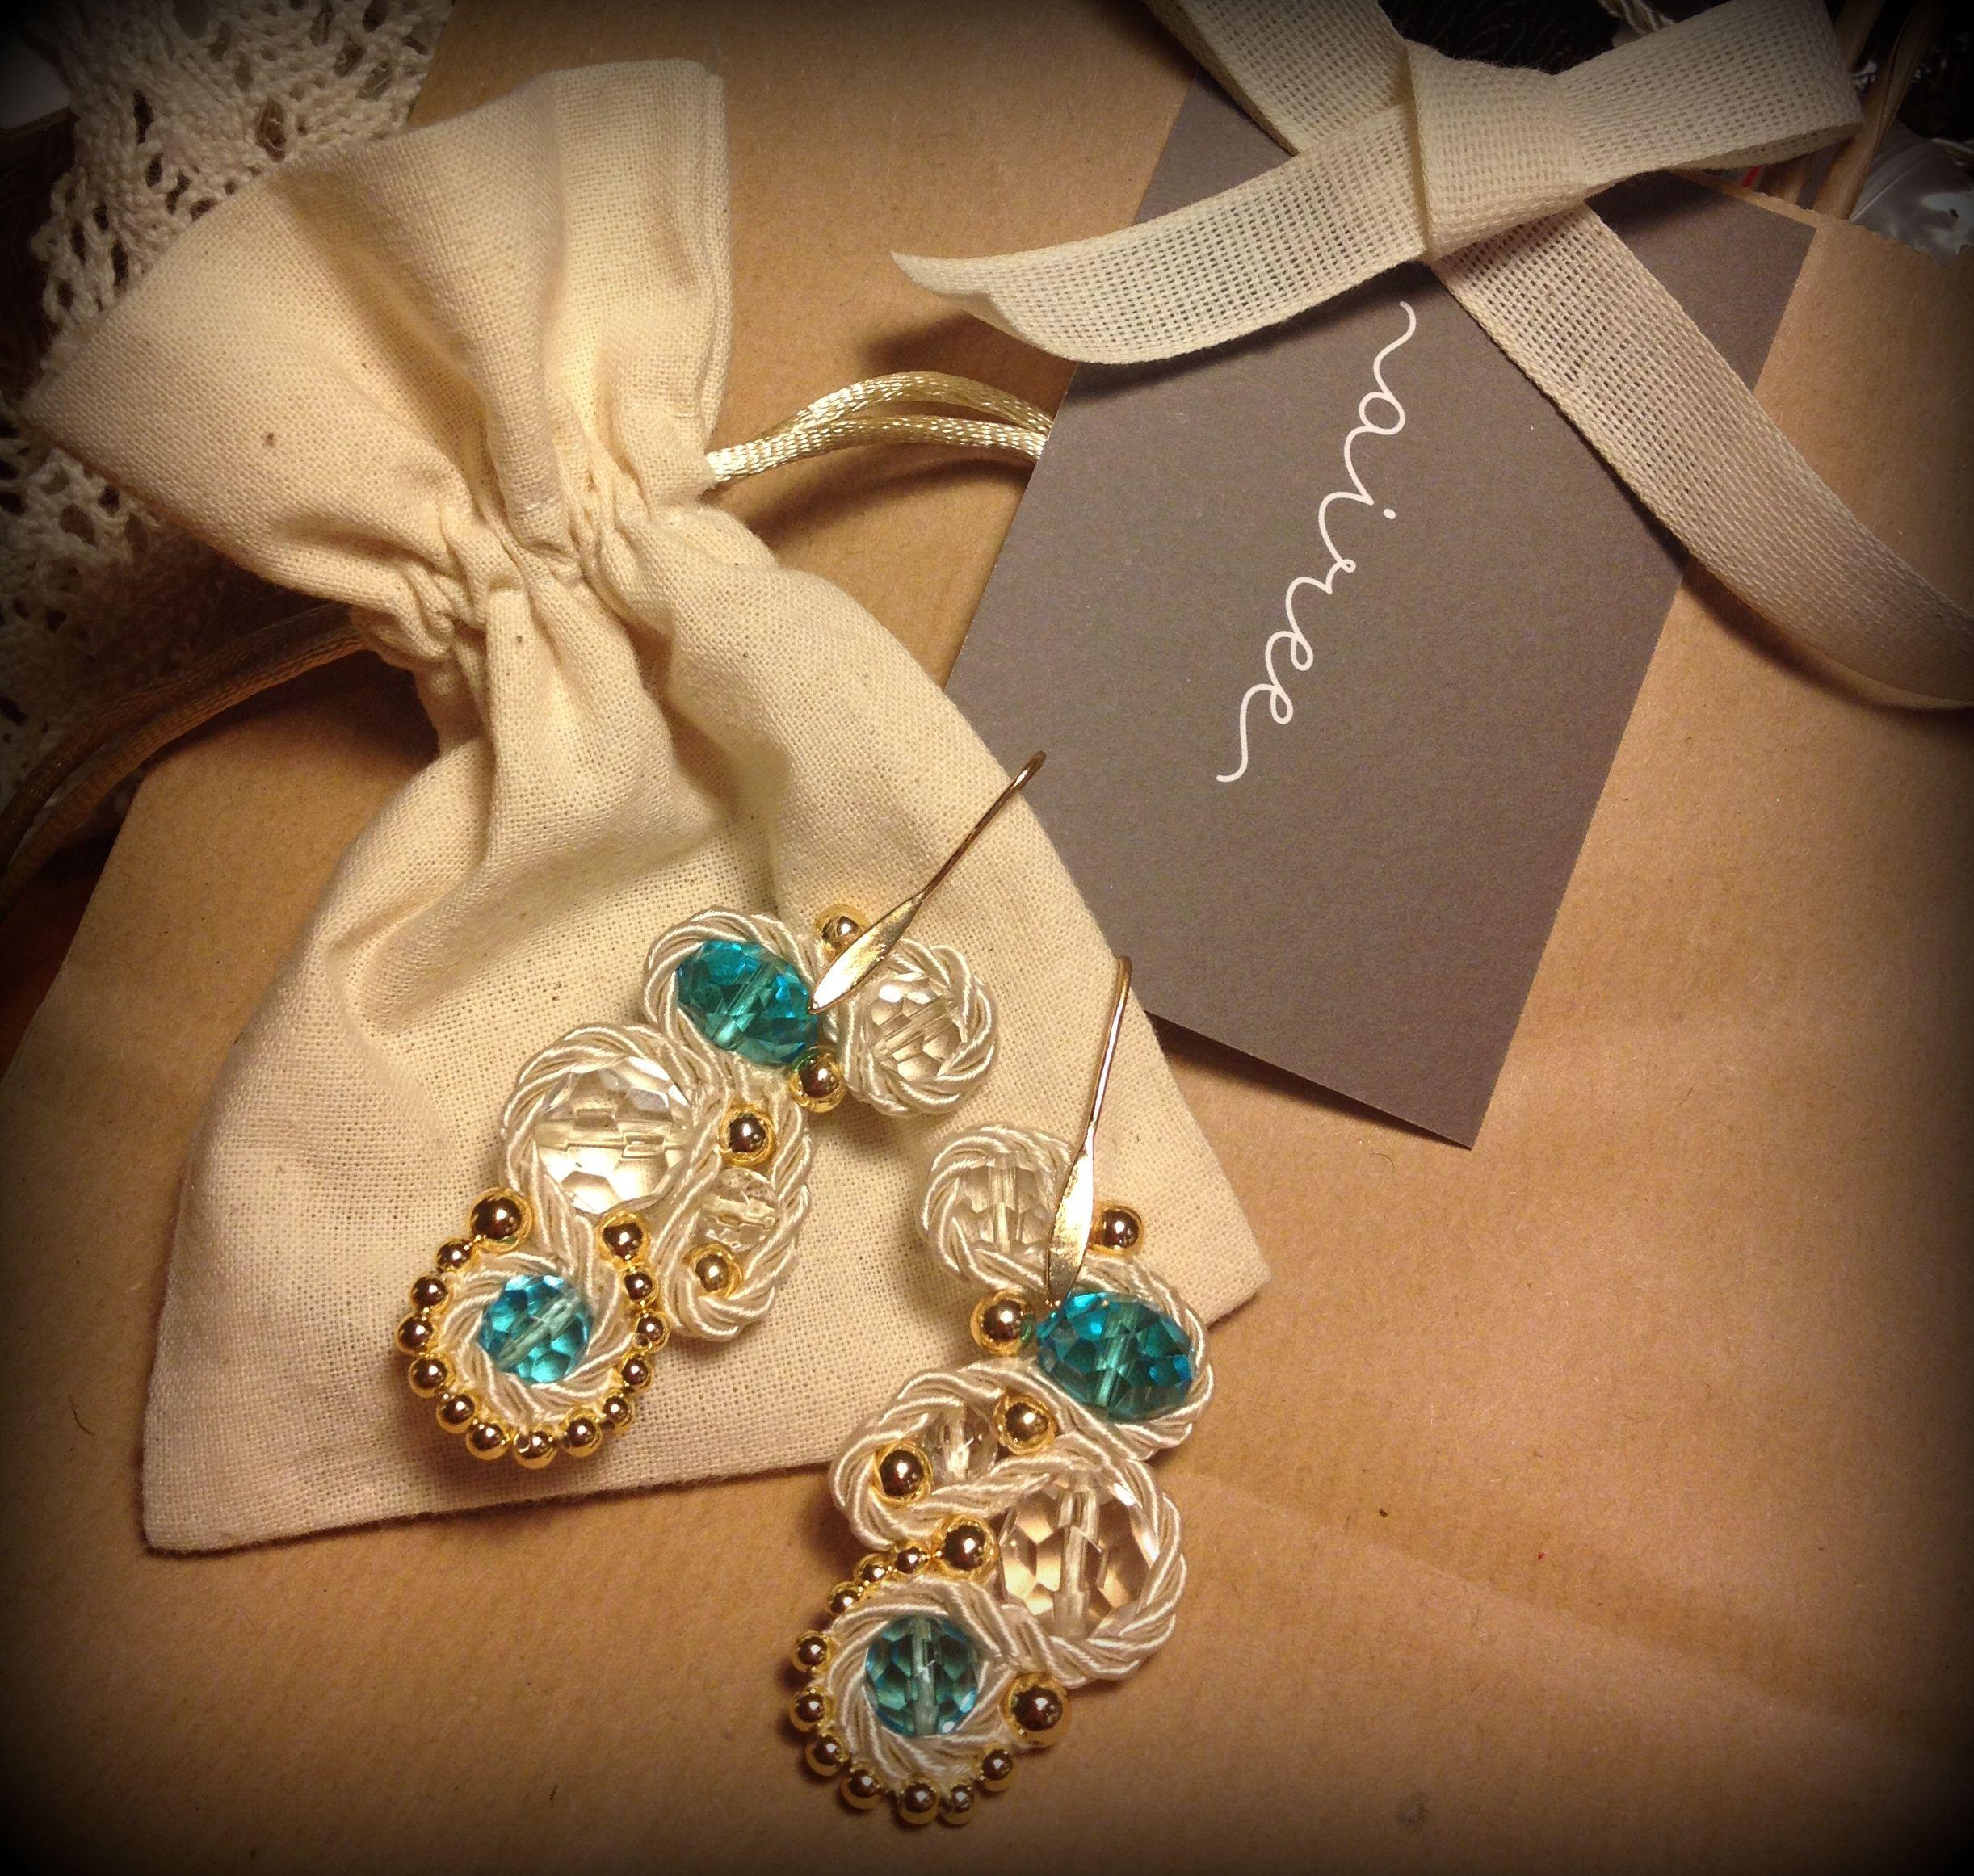 Customized jewels